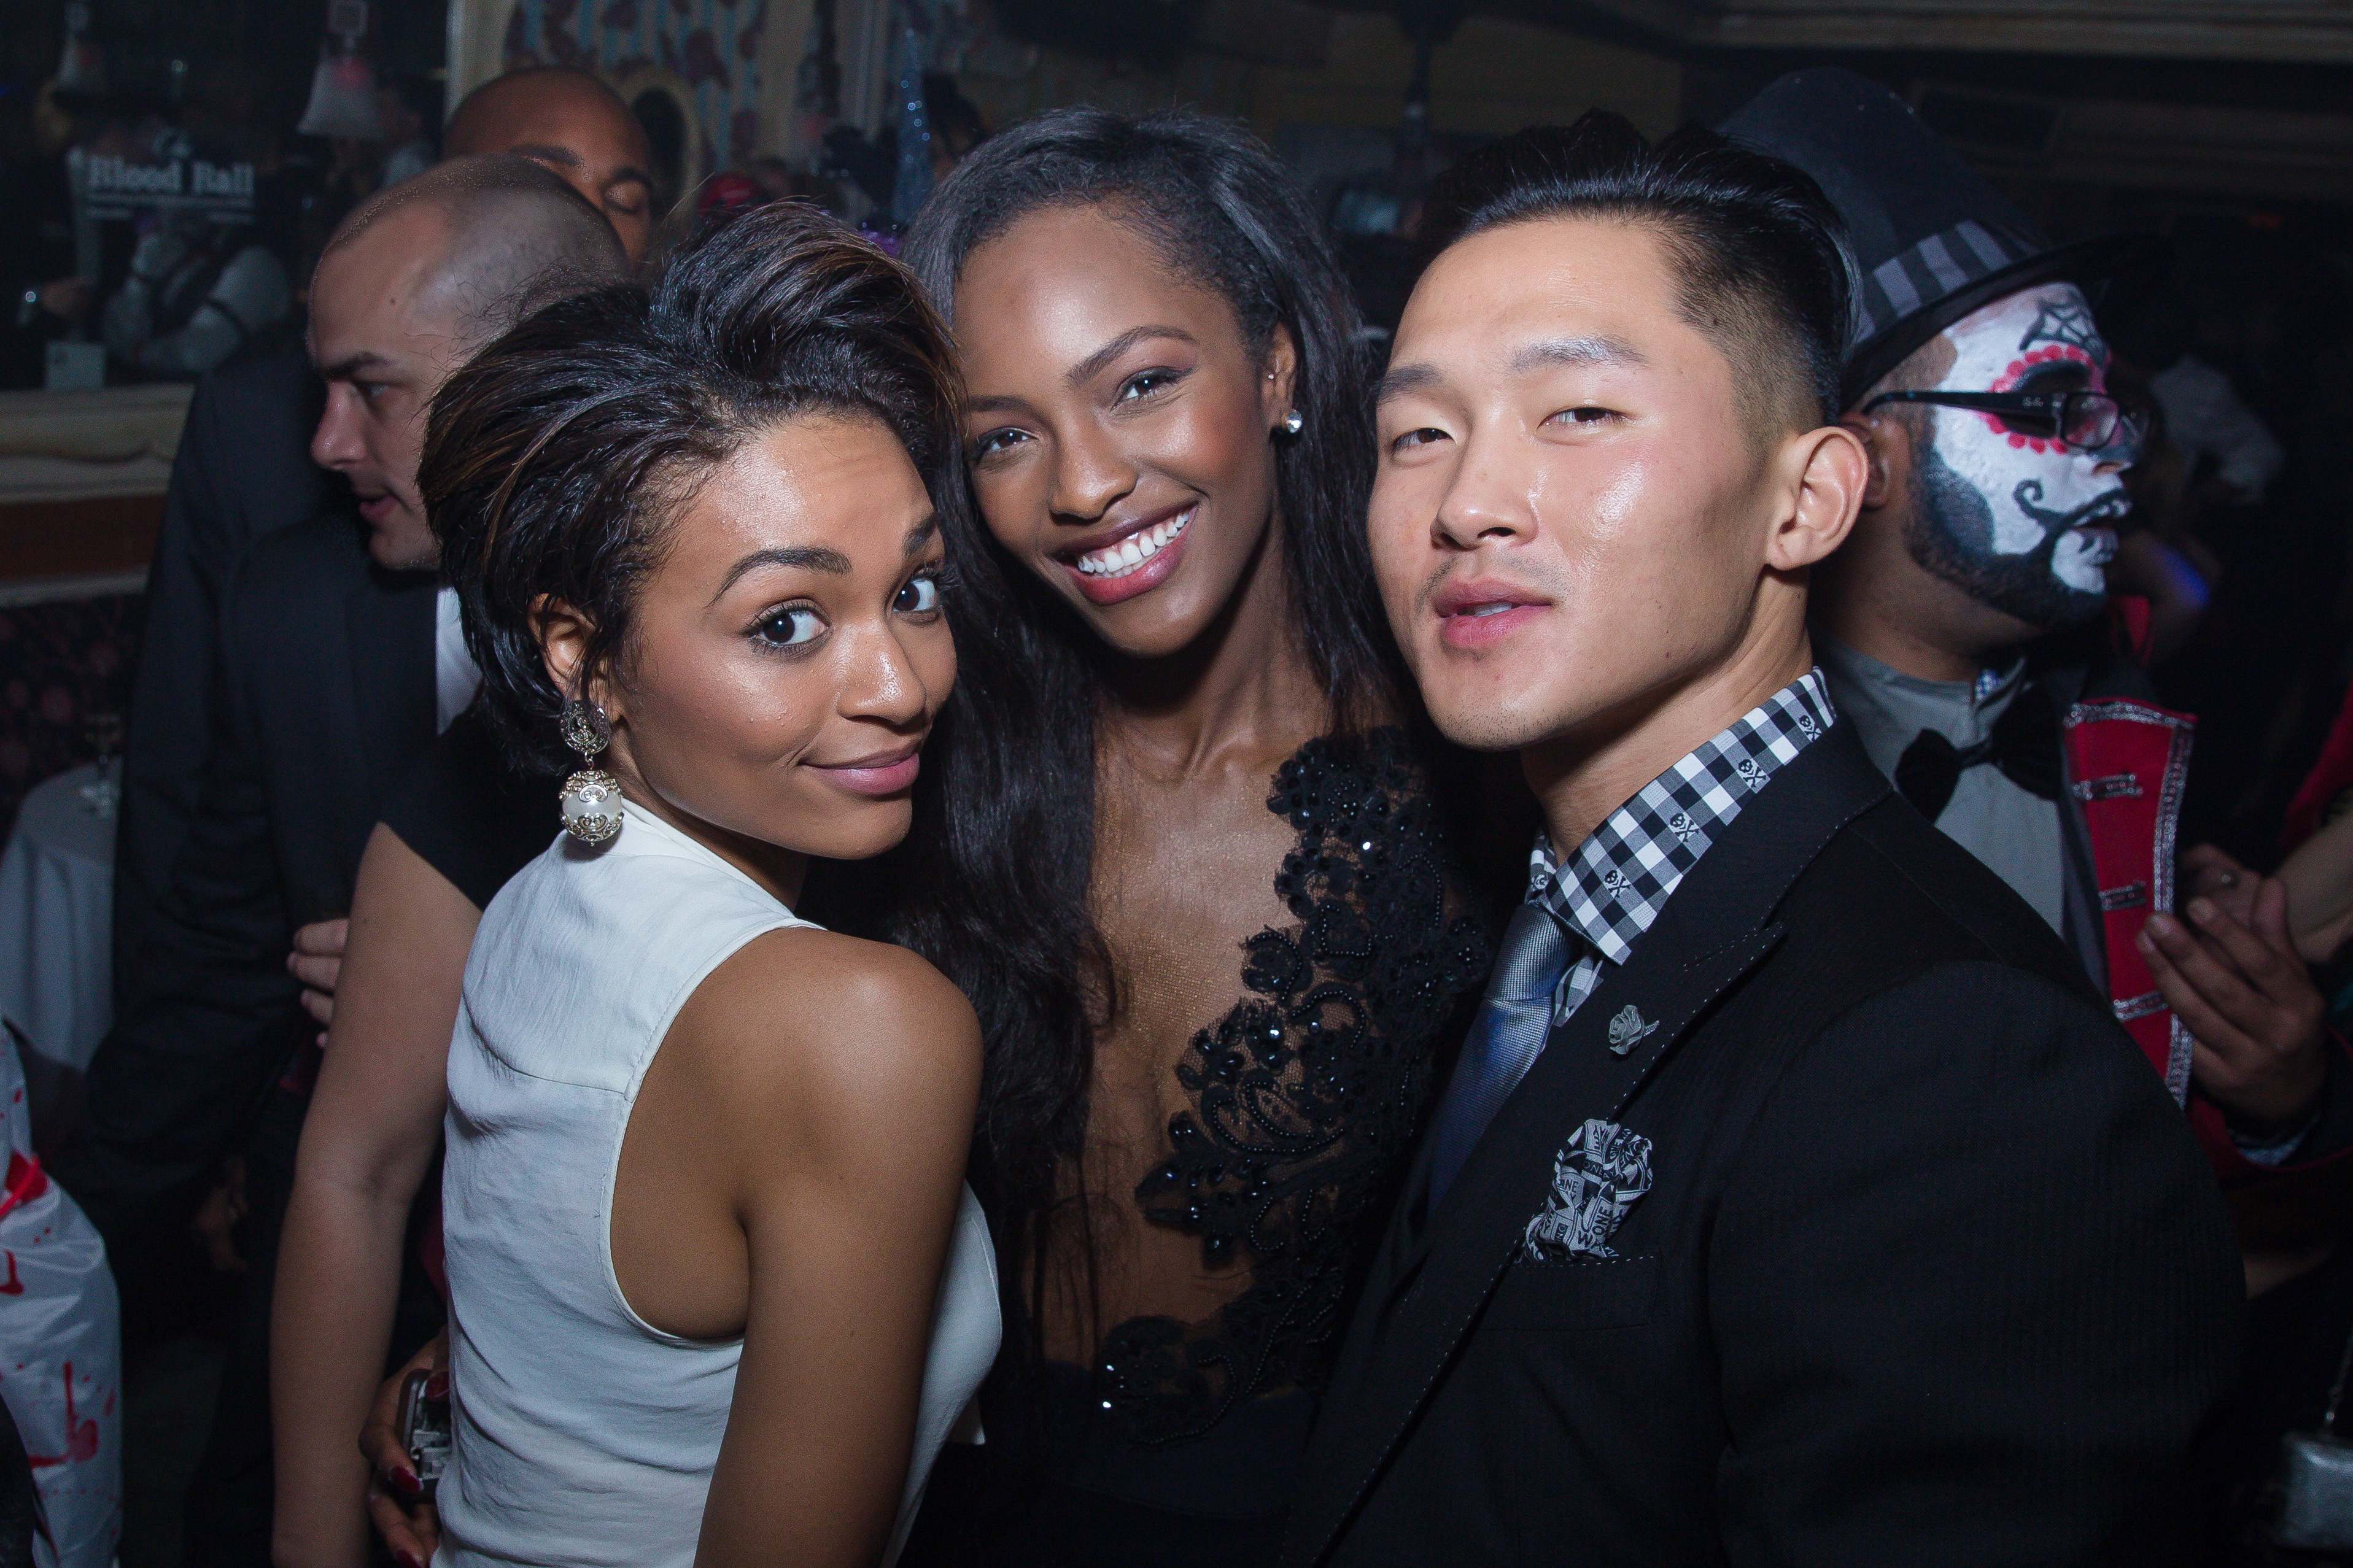 Ashley Molina, Mame Adjei, and Justin Kim